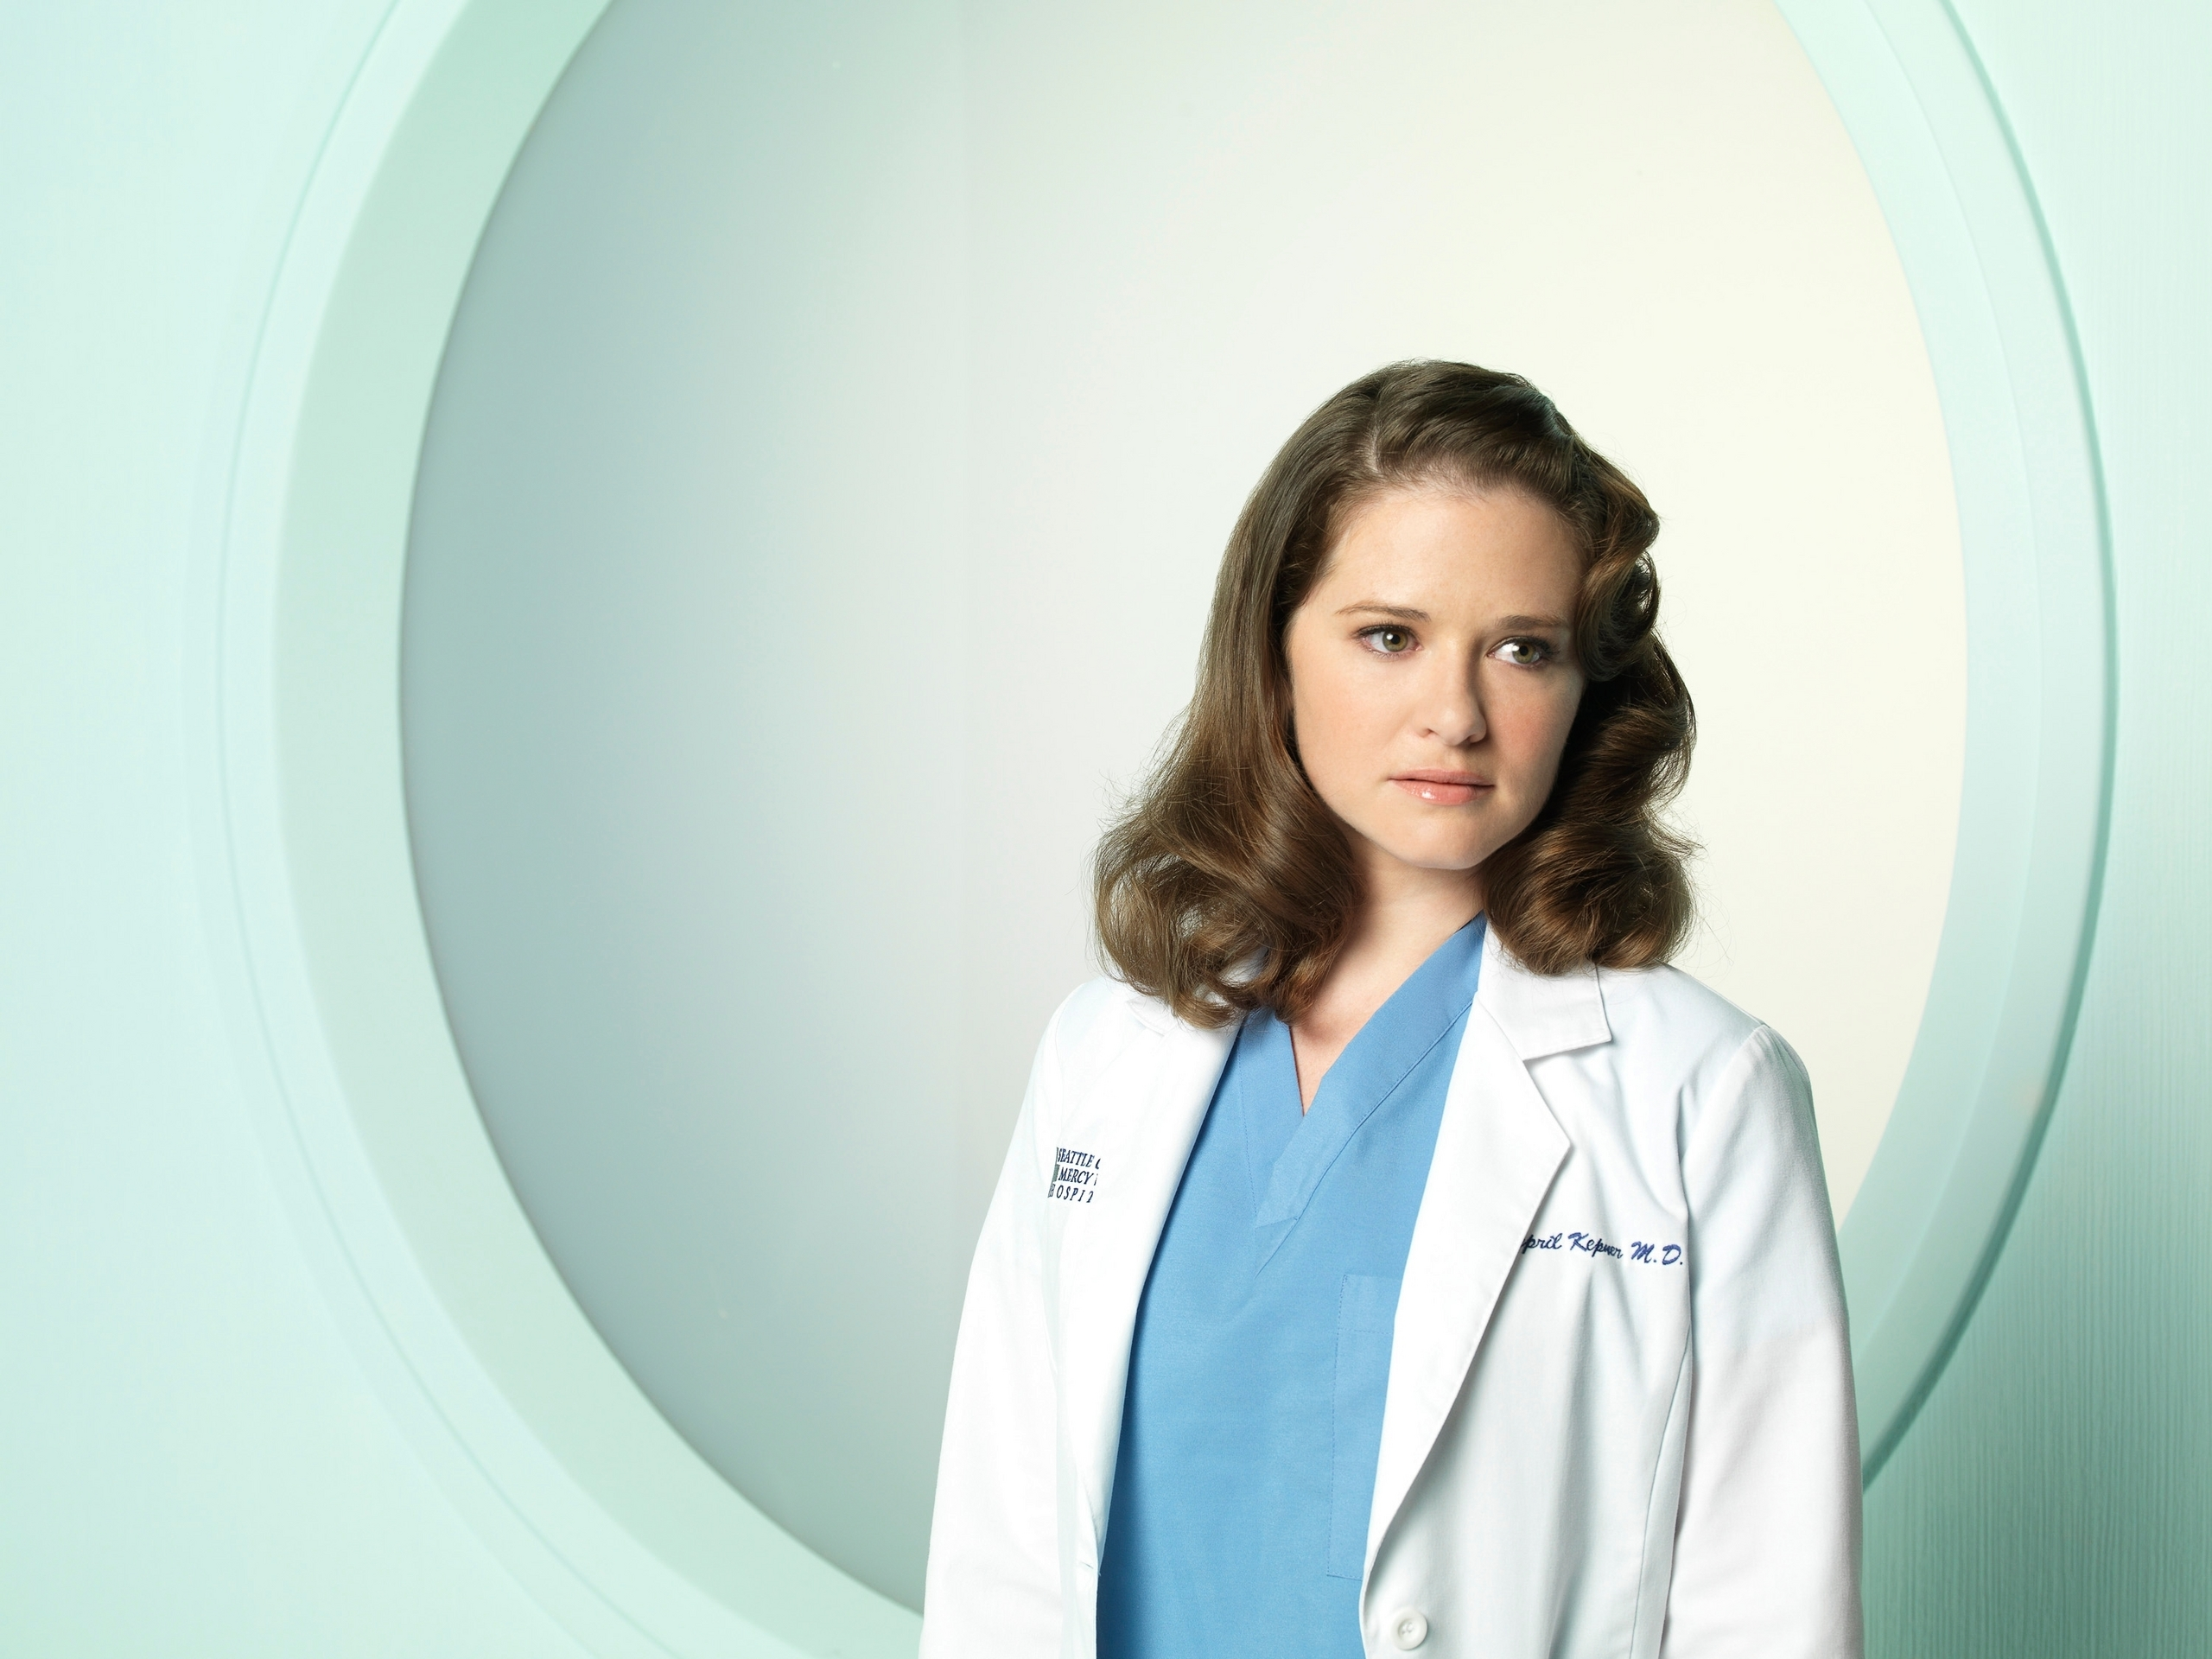 Image Aprilkepner3s7g Greys Anatomy Universe Wiki Fandom